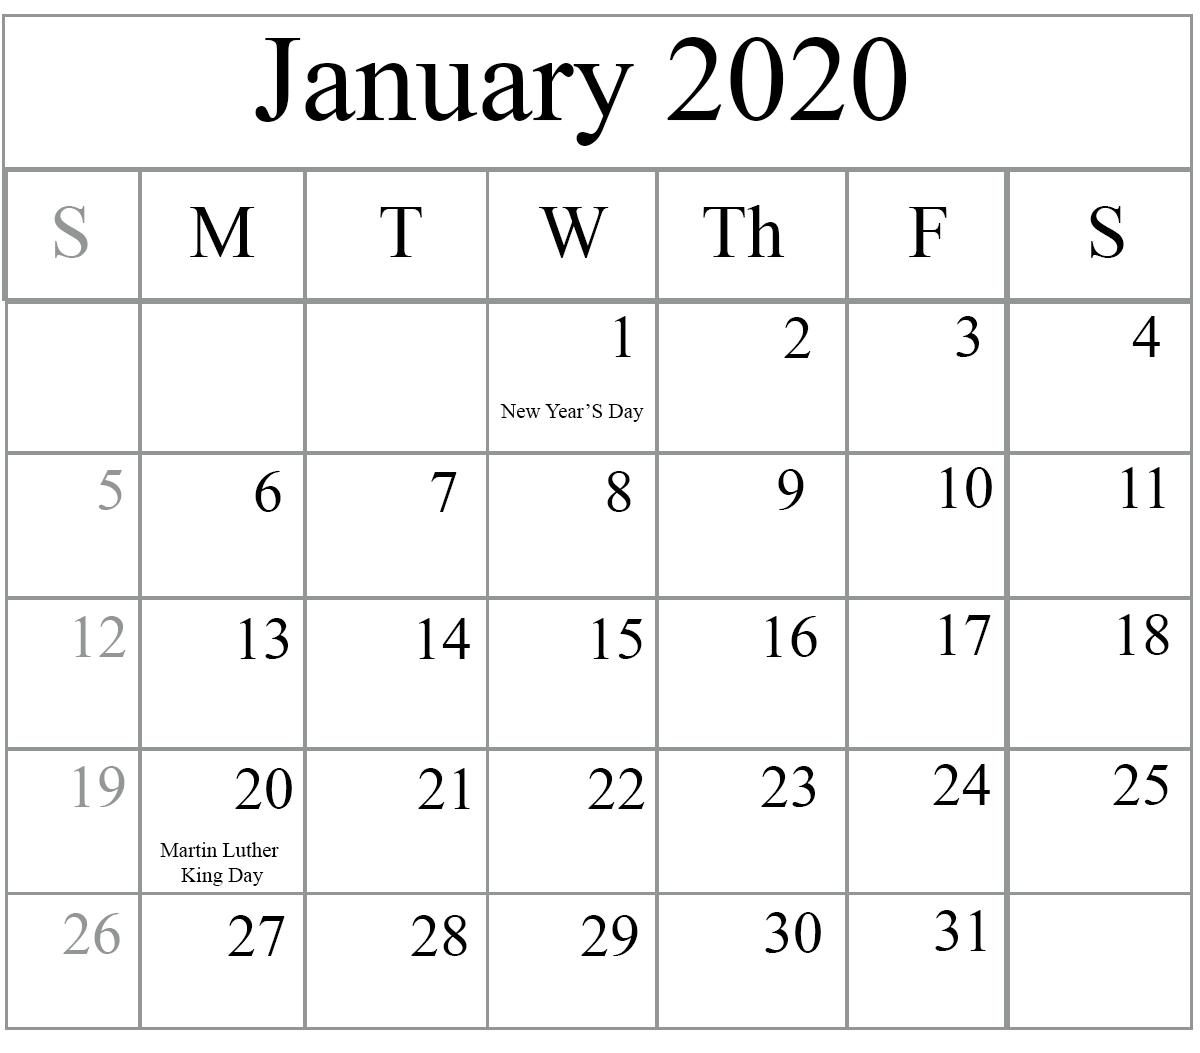 2020 January Calendar Printable